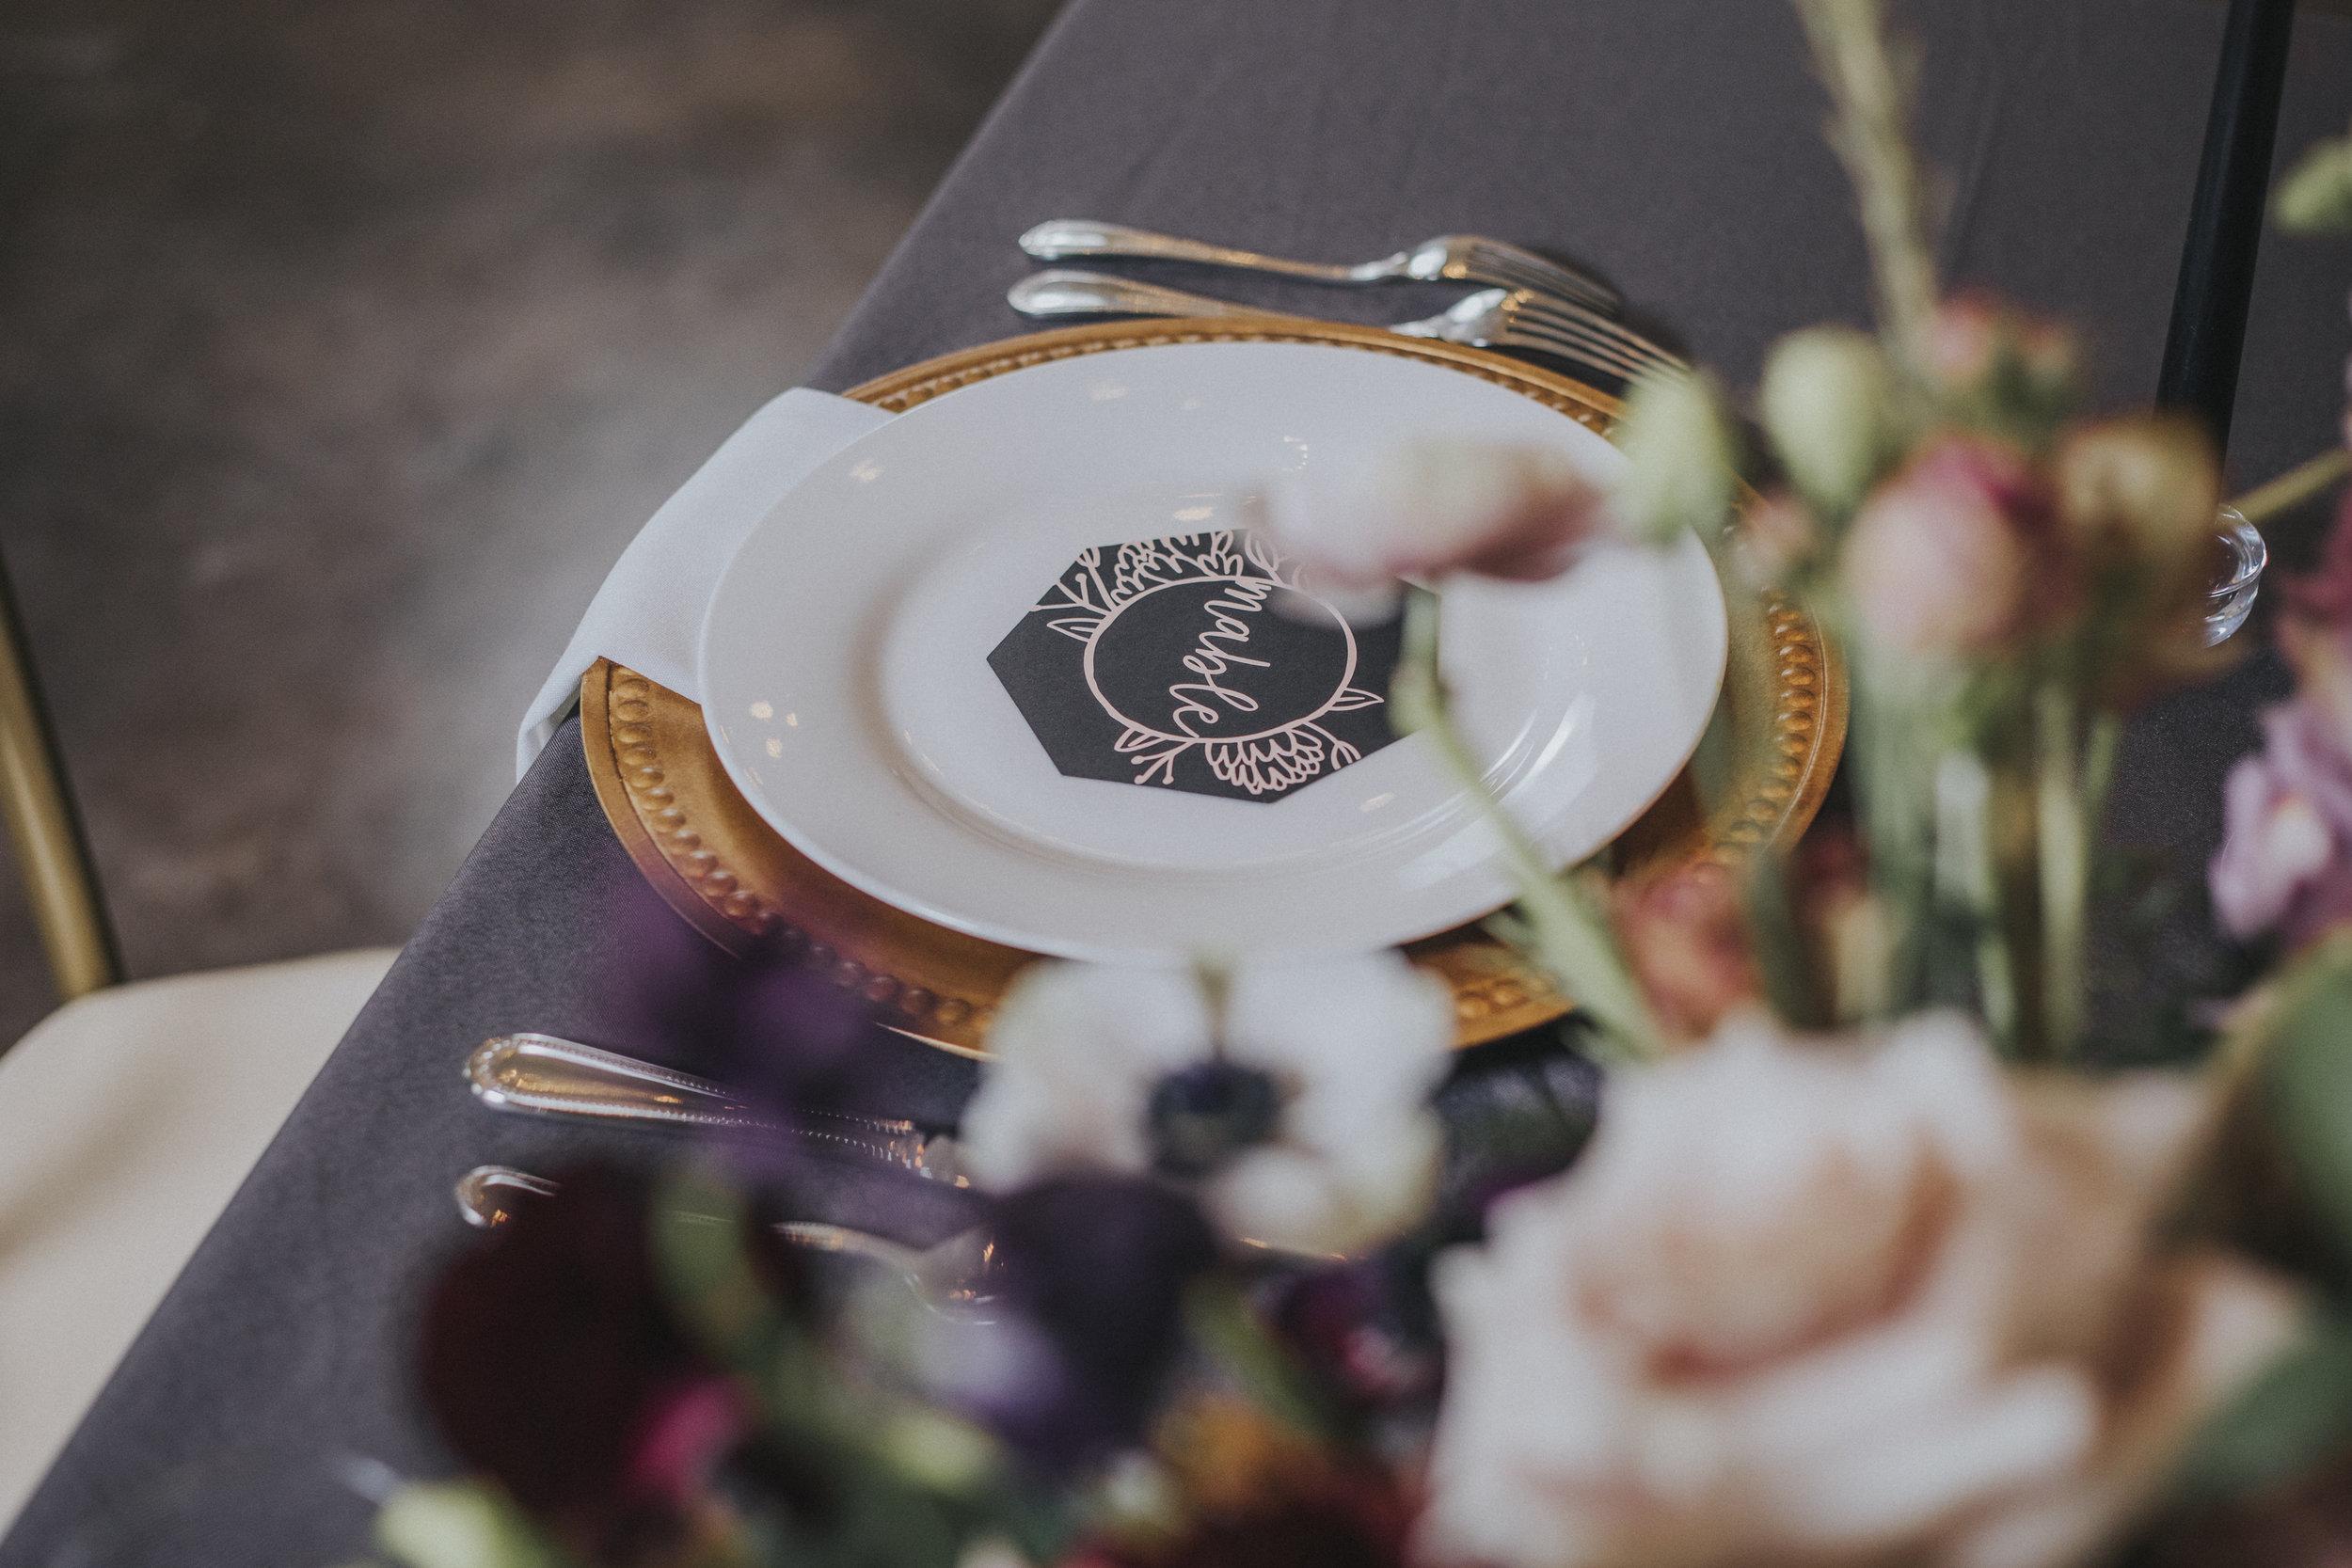 110  omaha-nebraska-empire-room-tiny-luxe-wedding-planner.jpg